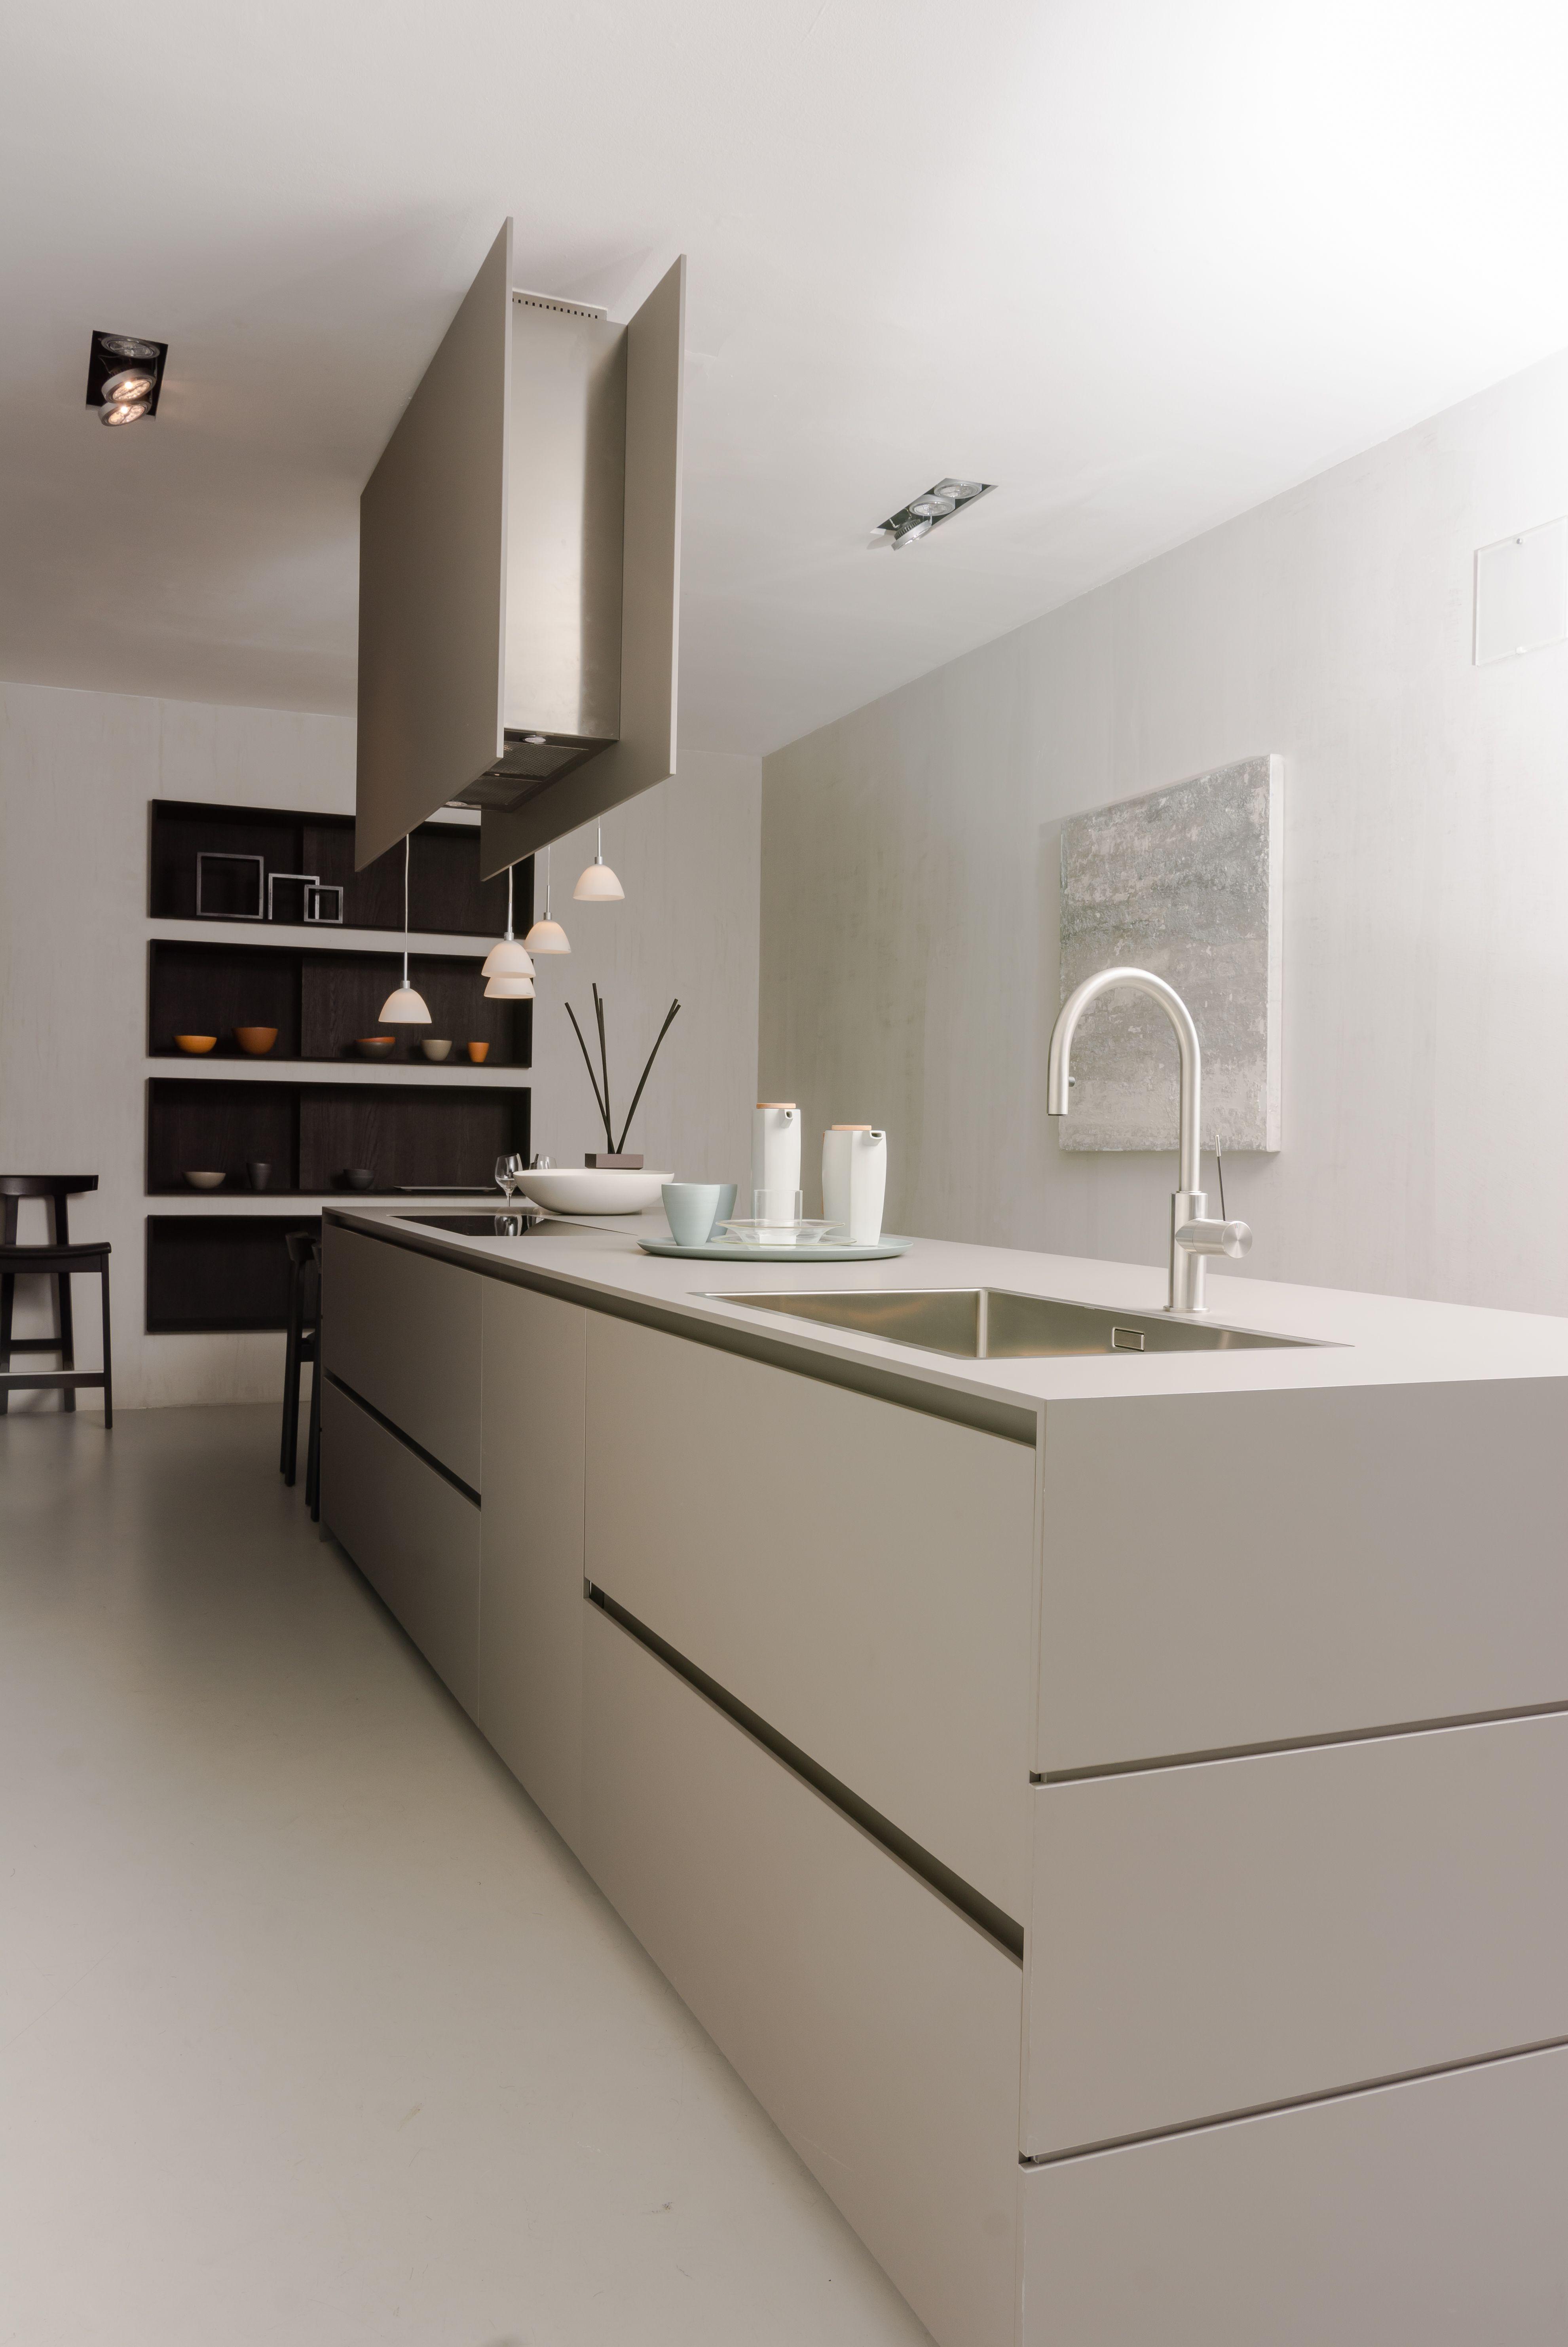 Searching For A Durable And Attractive Modern Kitchen Surface Check Out Fenix Ntm S Features And Product Keuken Ontwerp Keuken Ontwerpen Keuken Ideeen Modern